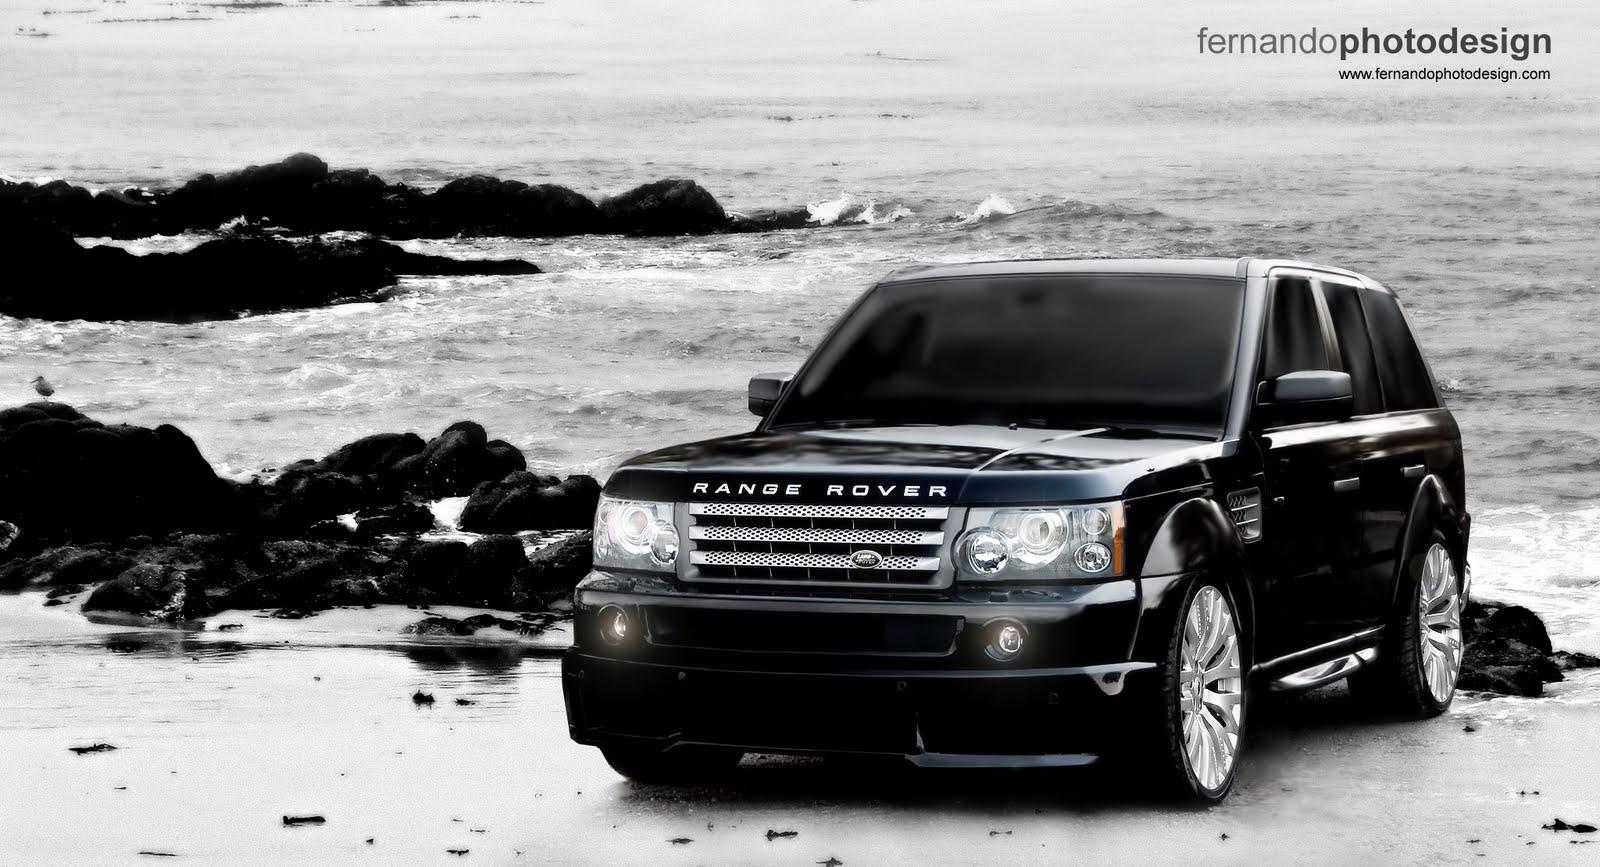 http://2.bp.blogspot.com/_YtUTU8LhjKU/S_rUMLVZSzI/AAAAAAAAACk/oBHSJr0iQjw/s1600/wallpaper-carros-hd.jpg